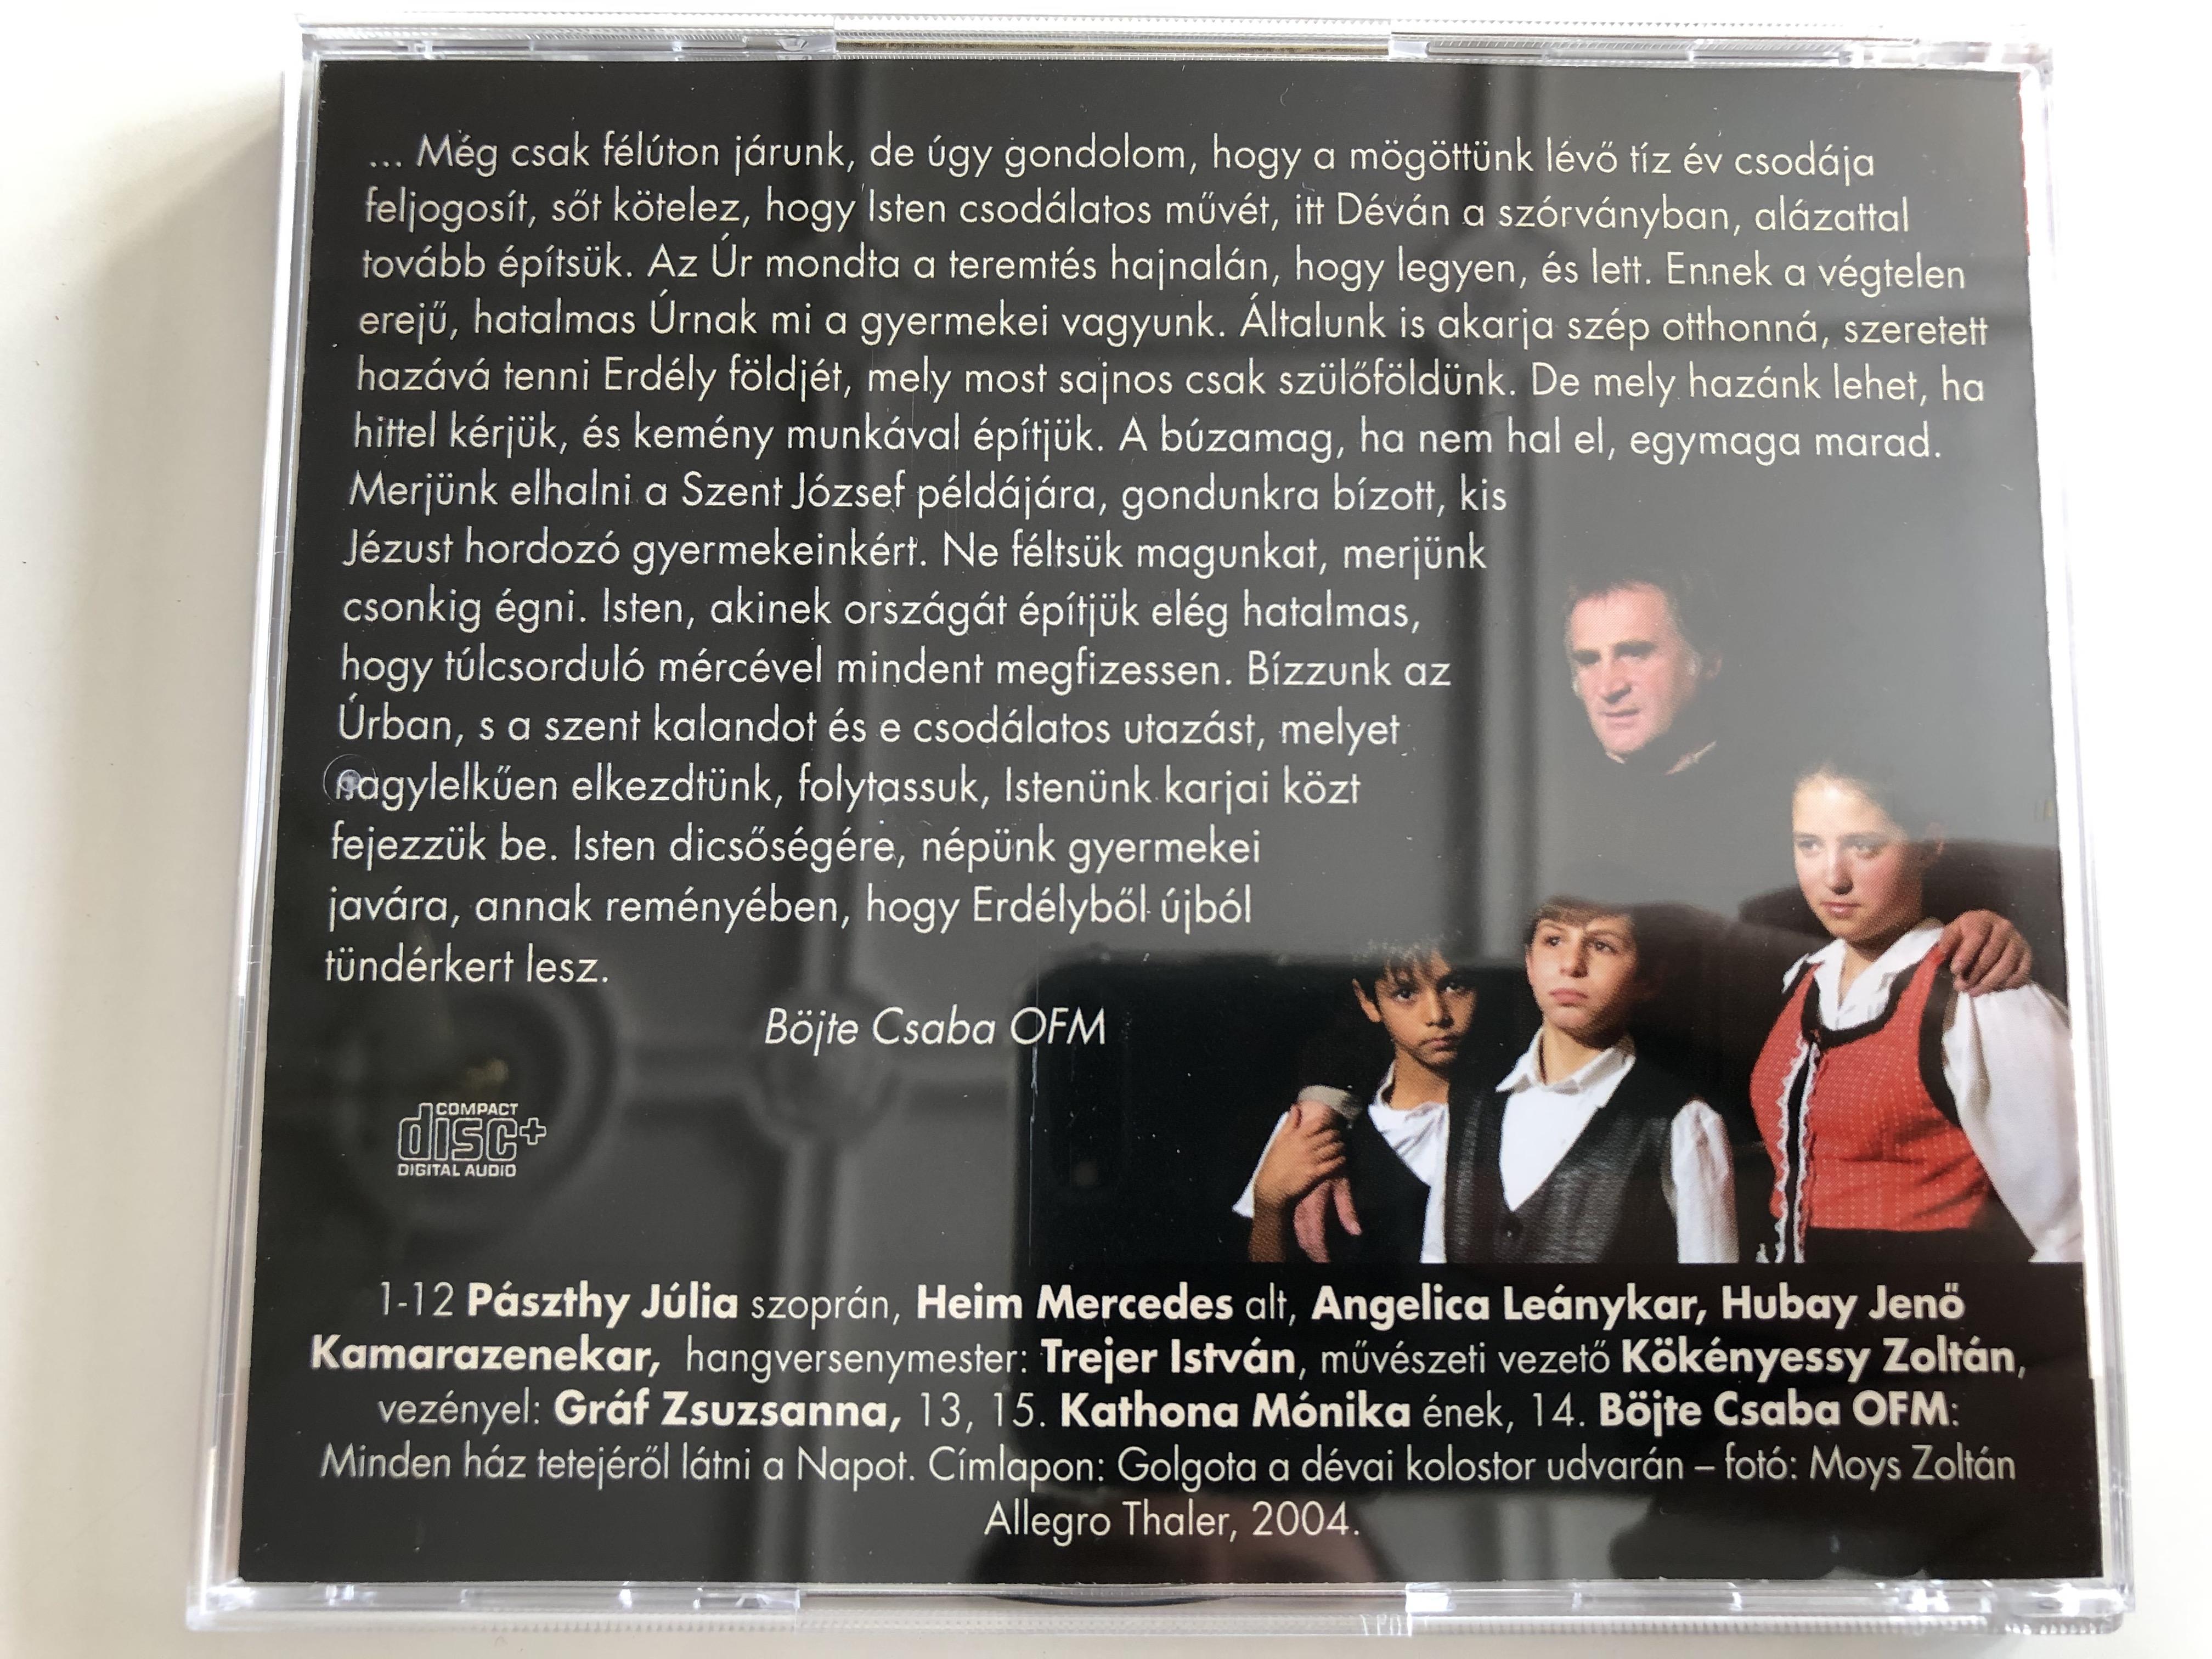 pergolesi-stabat-mater-allegro-thaler-audio-cd-2004-mza-070-6-.jpg